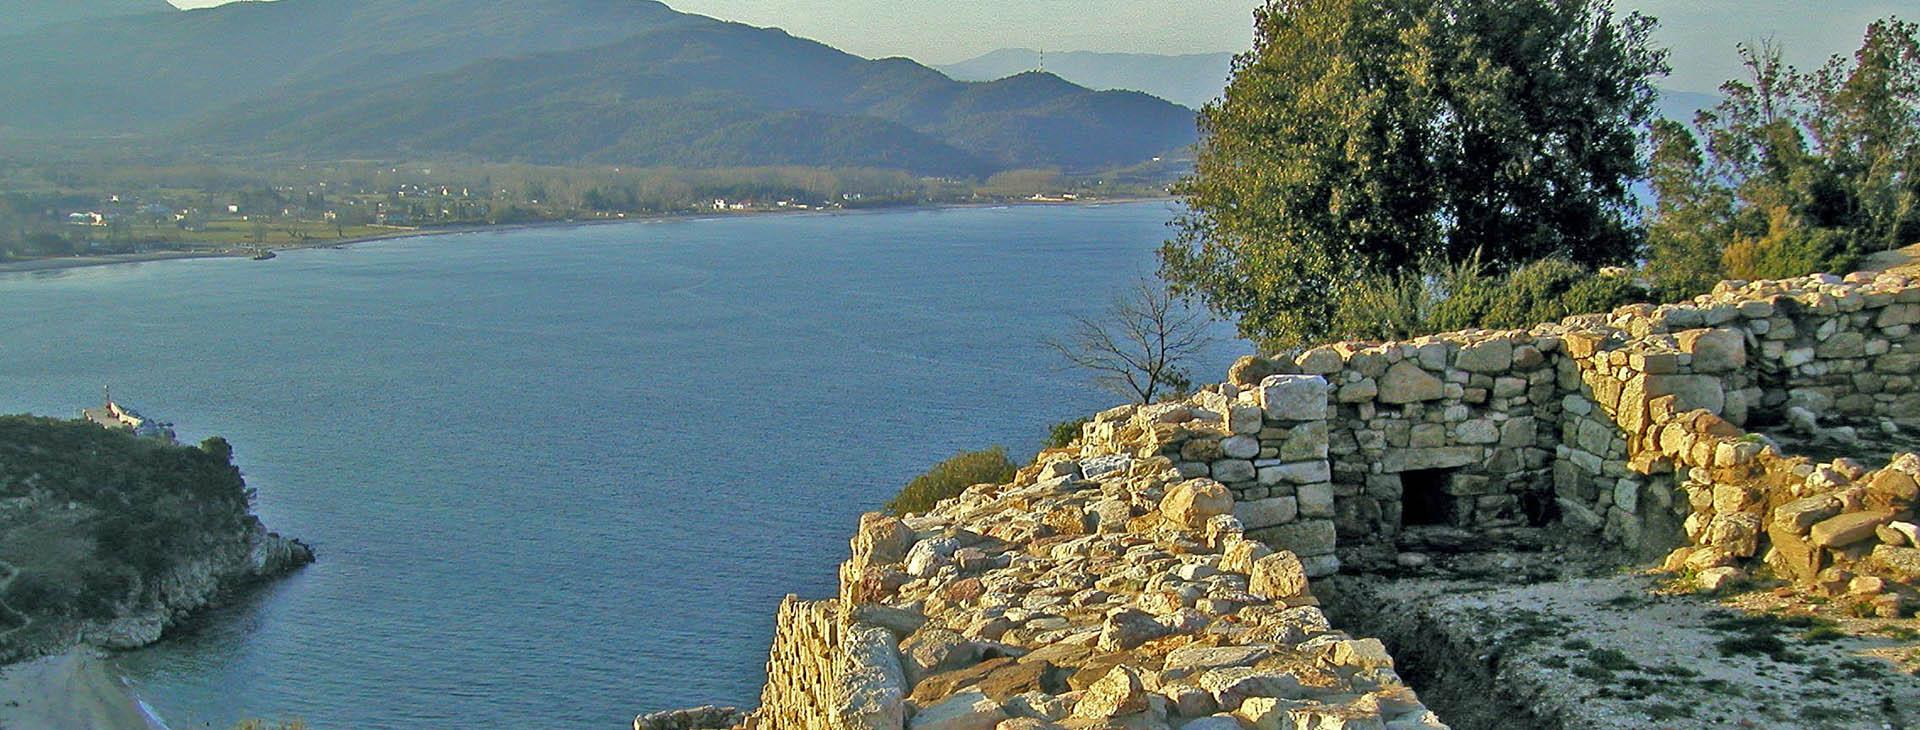 Archaeological site of Stageira, Halkidiki (Chalkidiki)